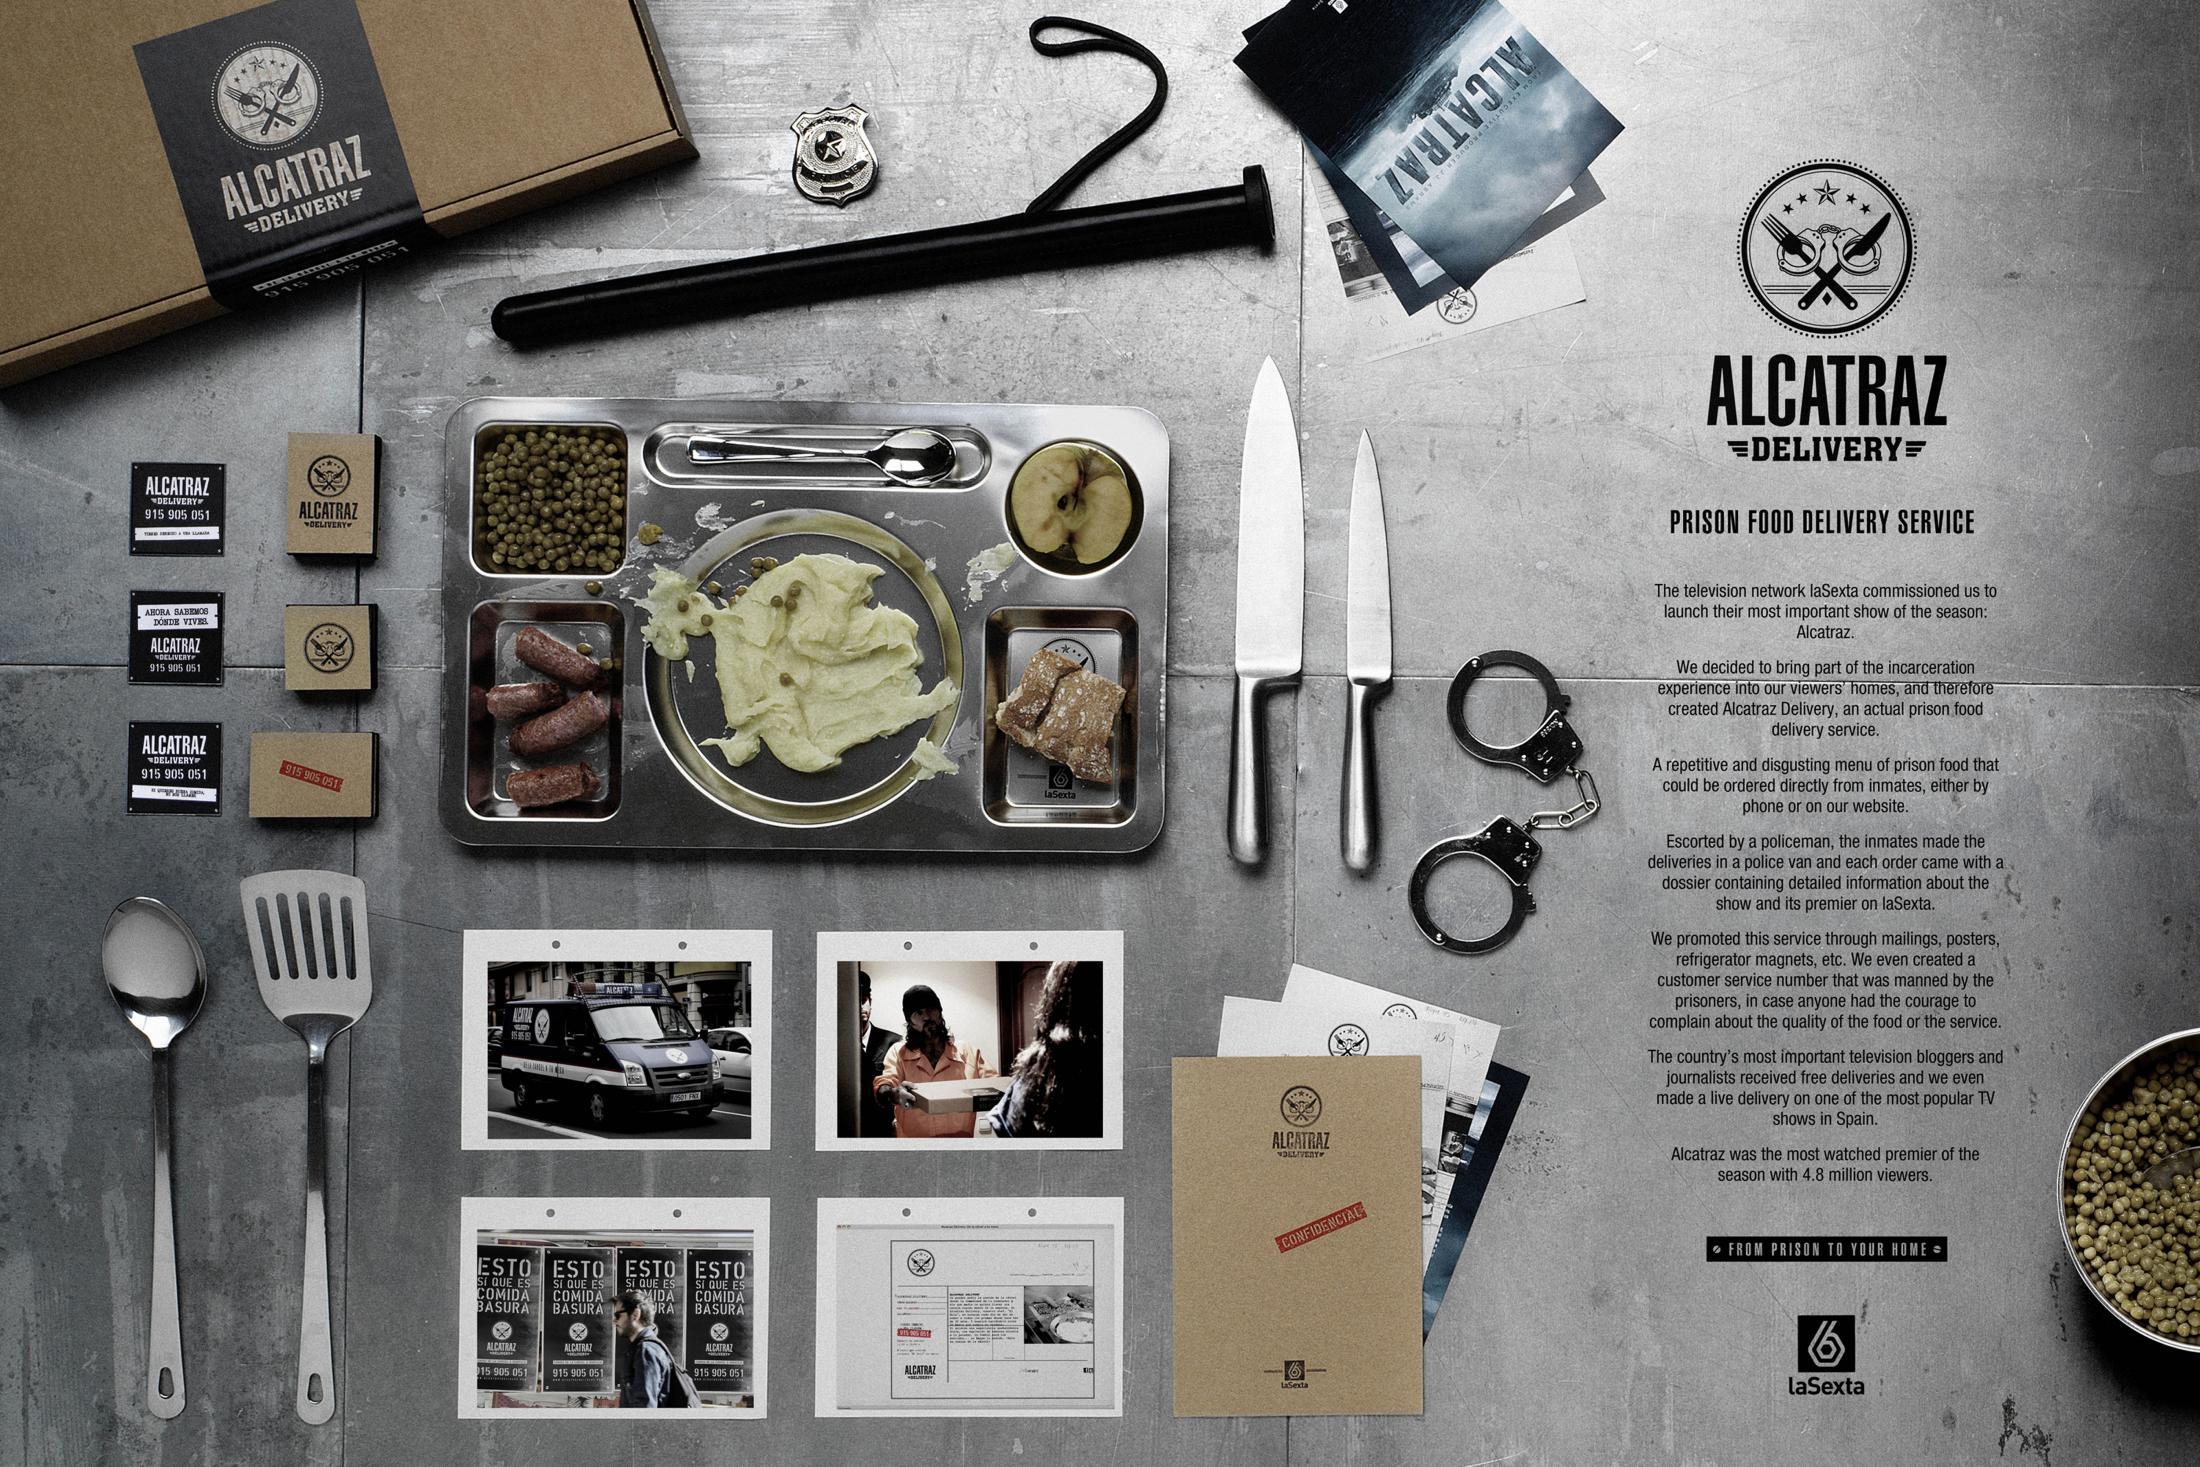 Thumbnail for Alcatraz Delivery